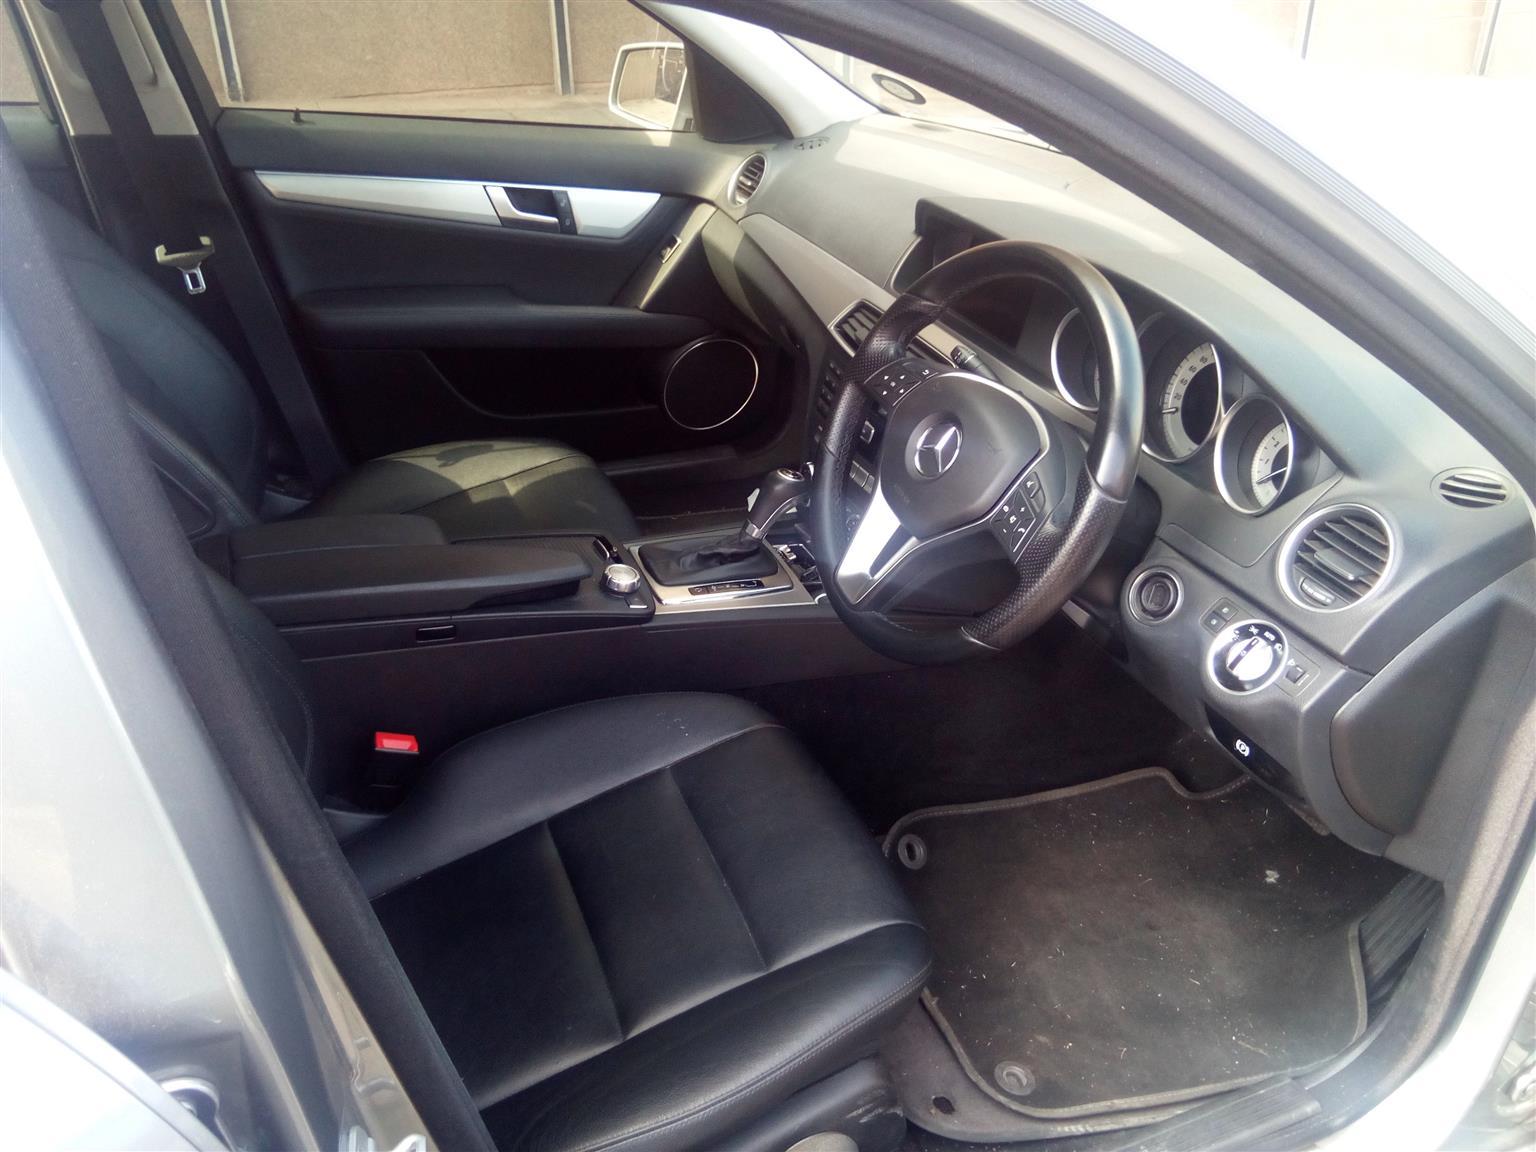 2011 Mercedes Benz C Class C180 estate Avantgarde